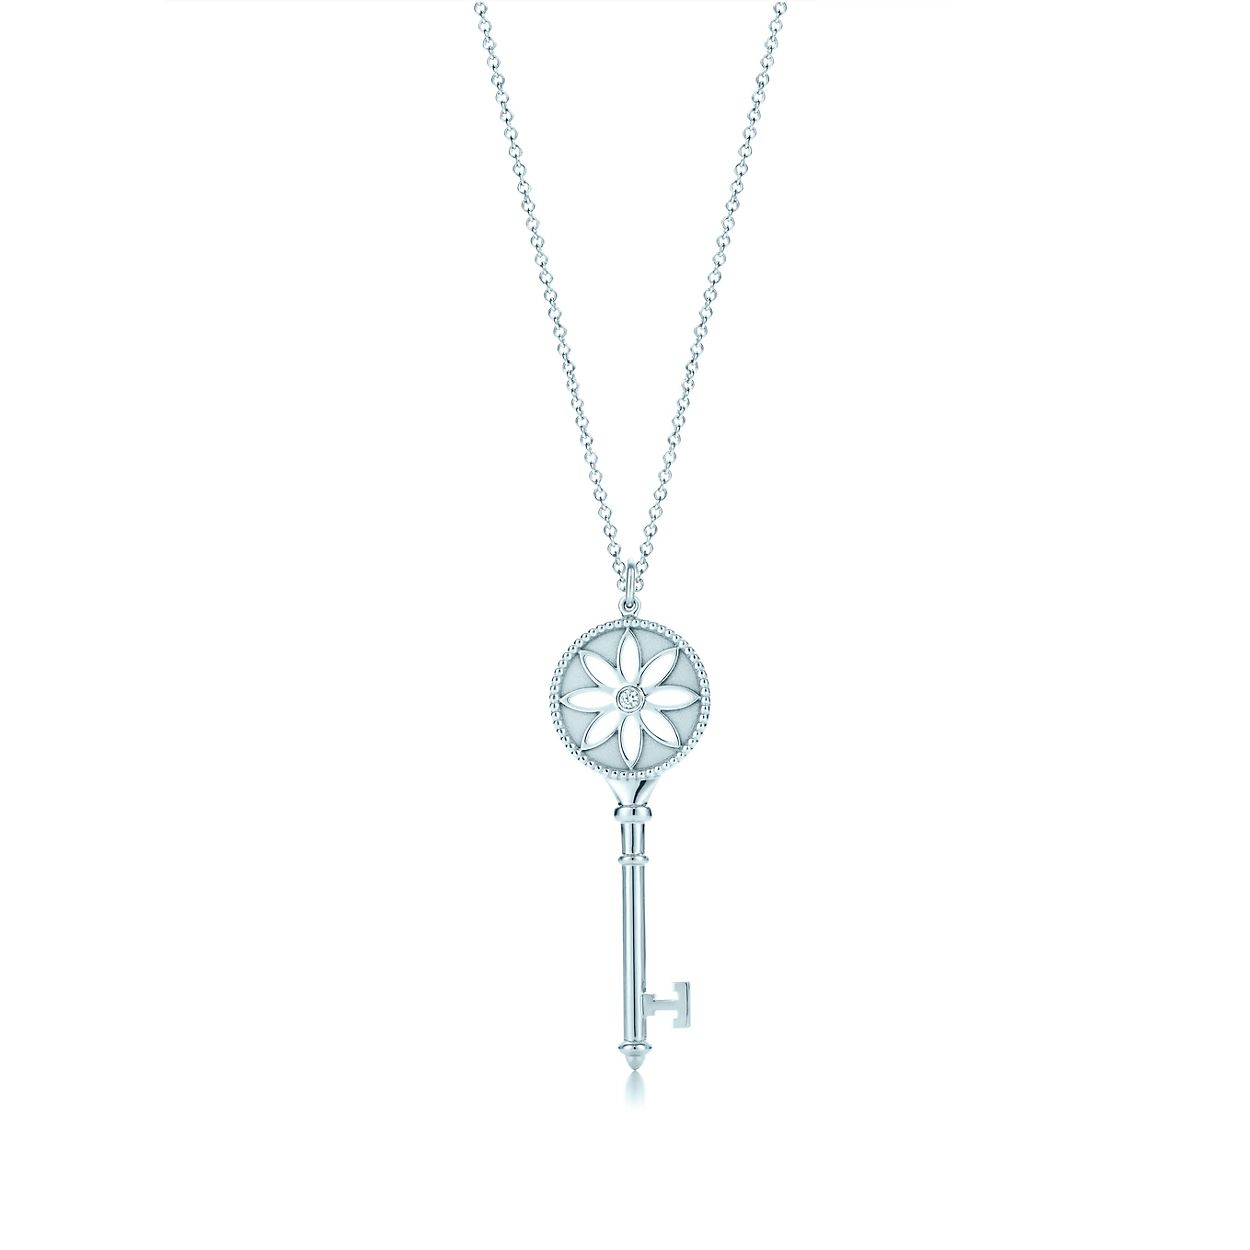 d8a35fa77 Tiffany Keys daisy key pendant in 18k white gold with a diamond on a ...